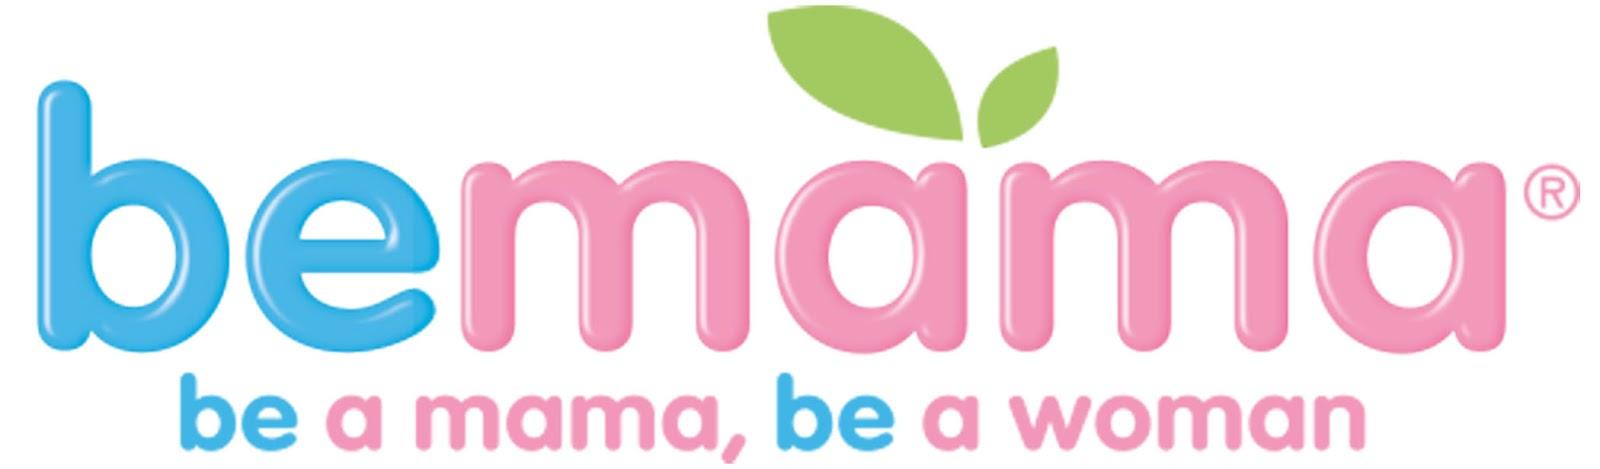 La cura del corpo durante la gravidanza con BeMama